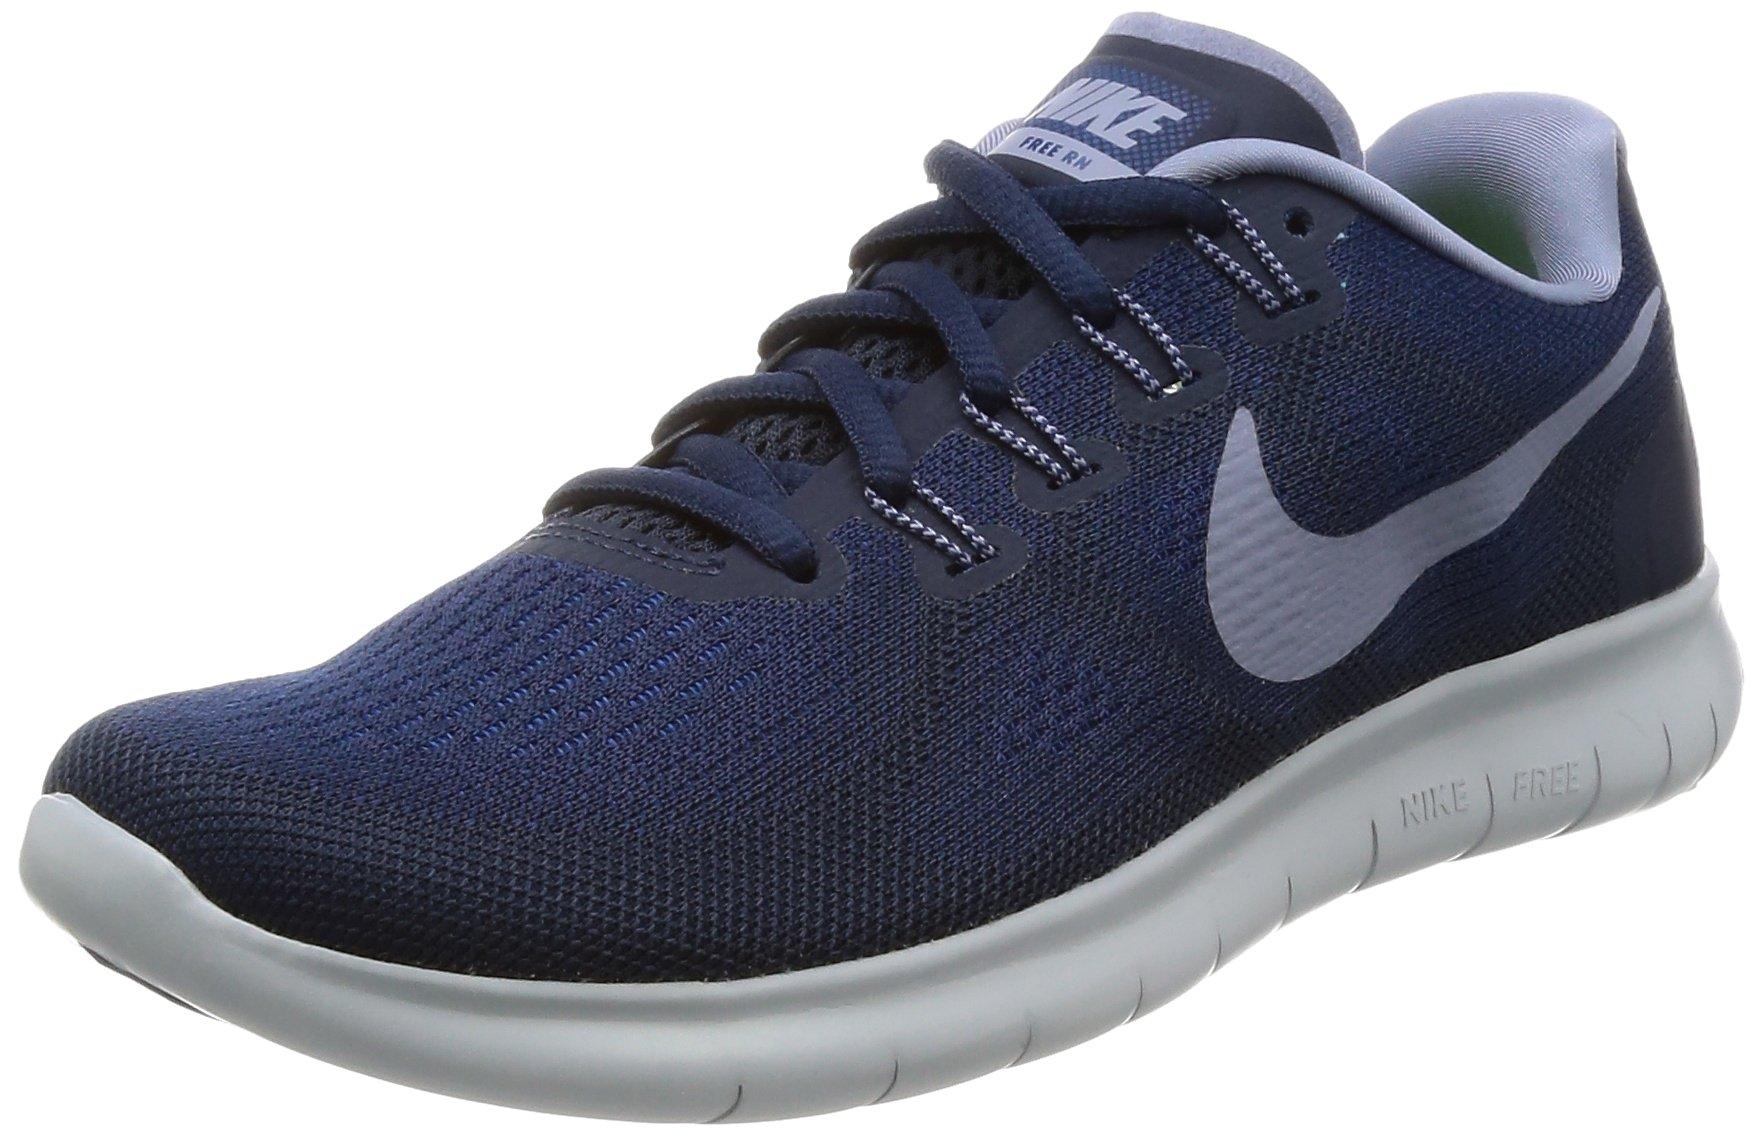 Nike Free RN 2017 Women's Running Shoes (6 M US, Binary Blue/Dark Sky Blue)